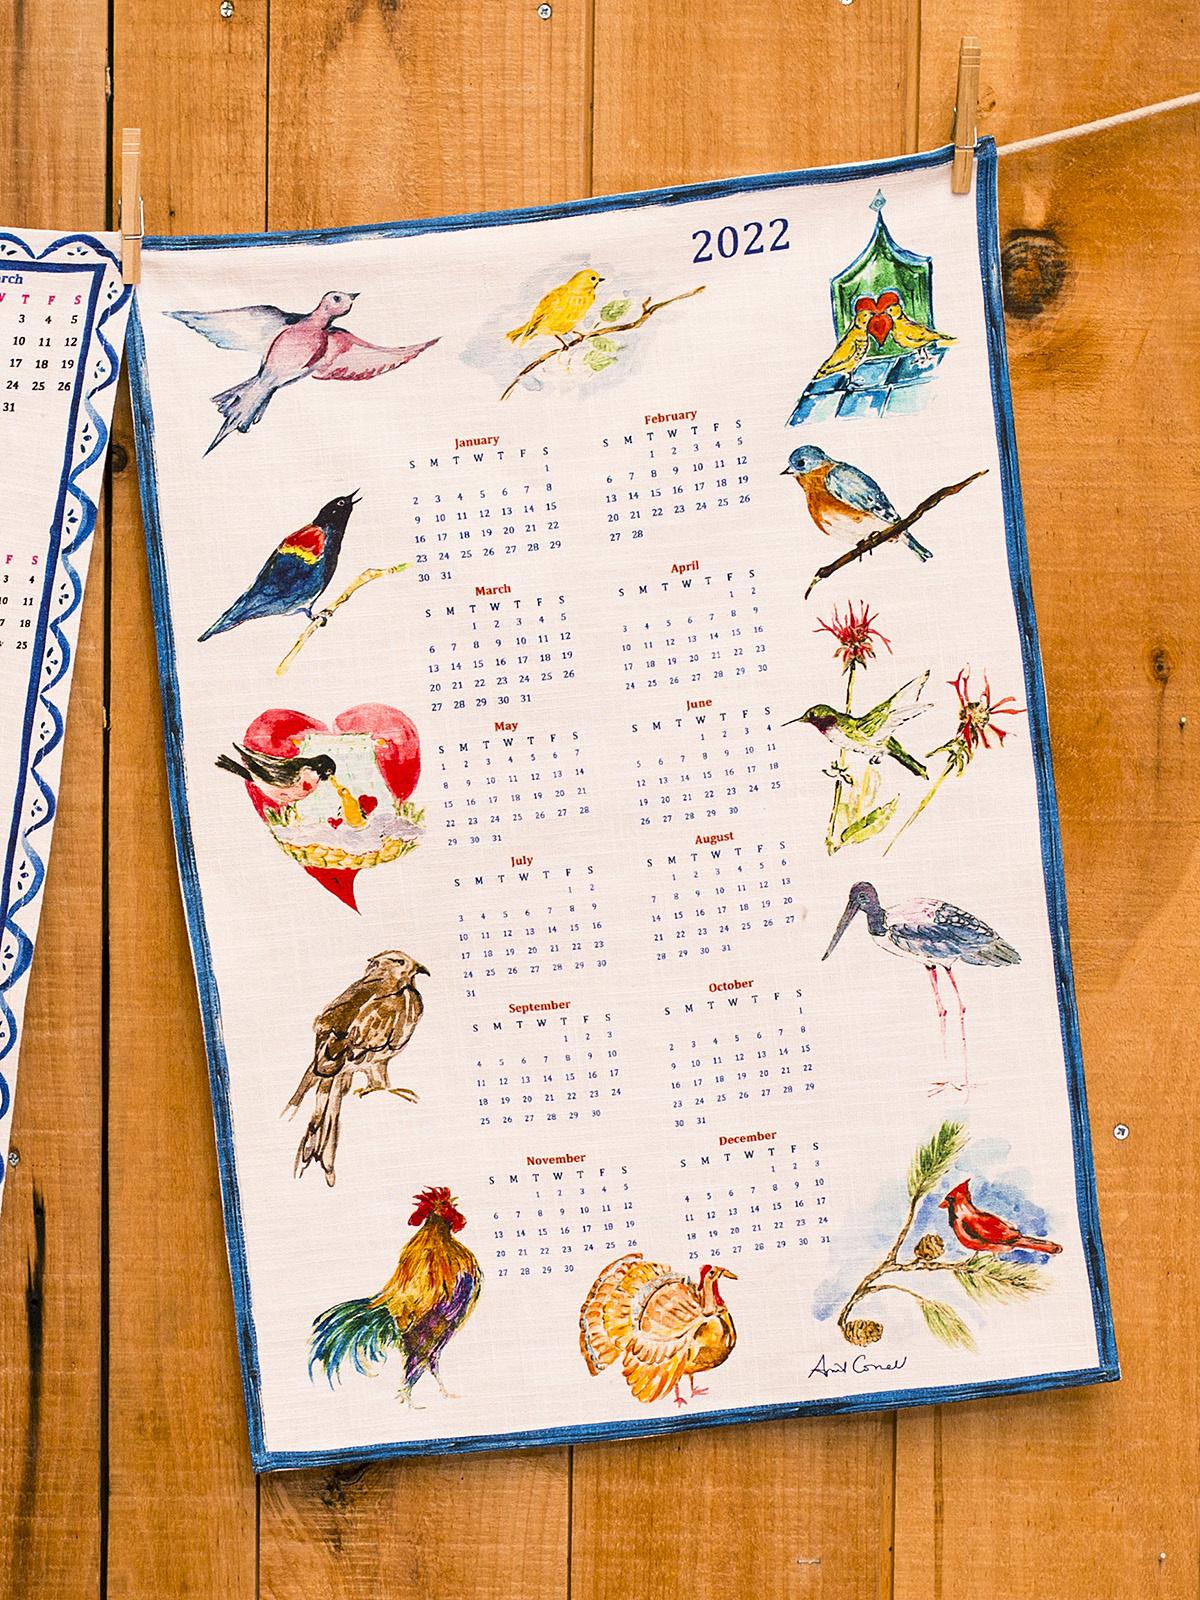 APRIL CORNELL A YEAR IN BIRDS TEA TOWEL-1